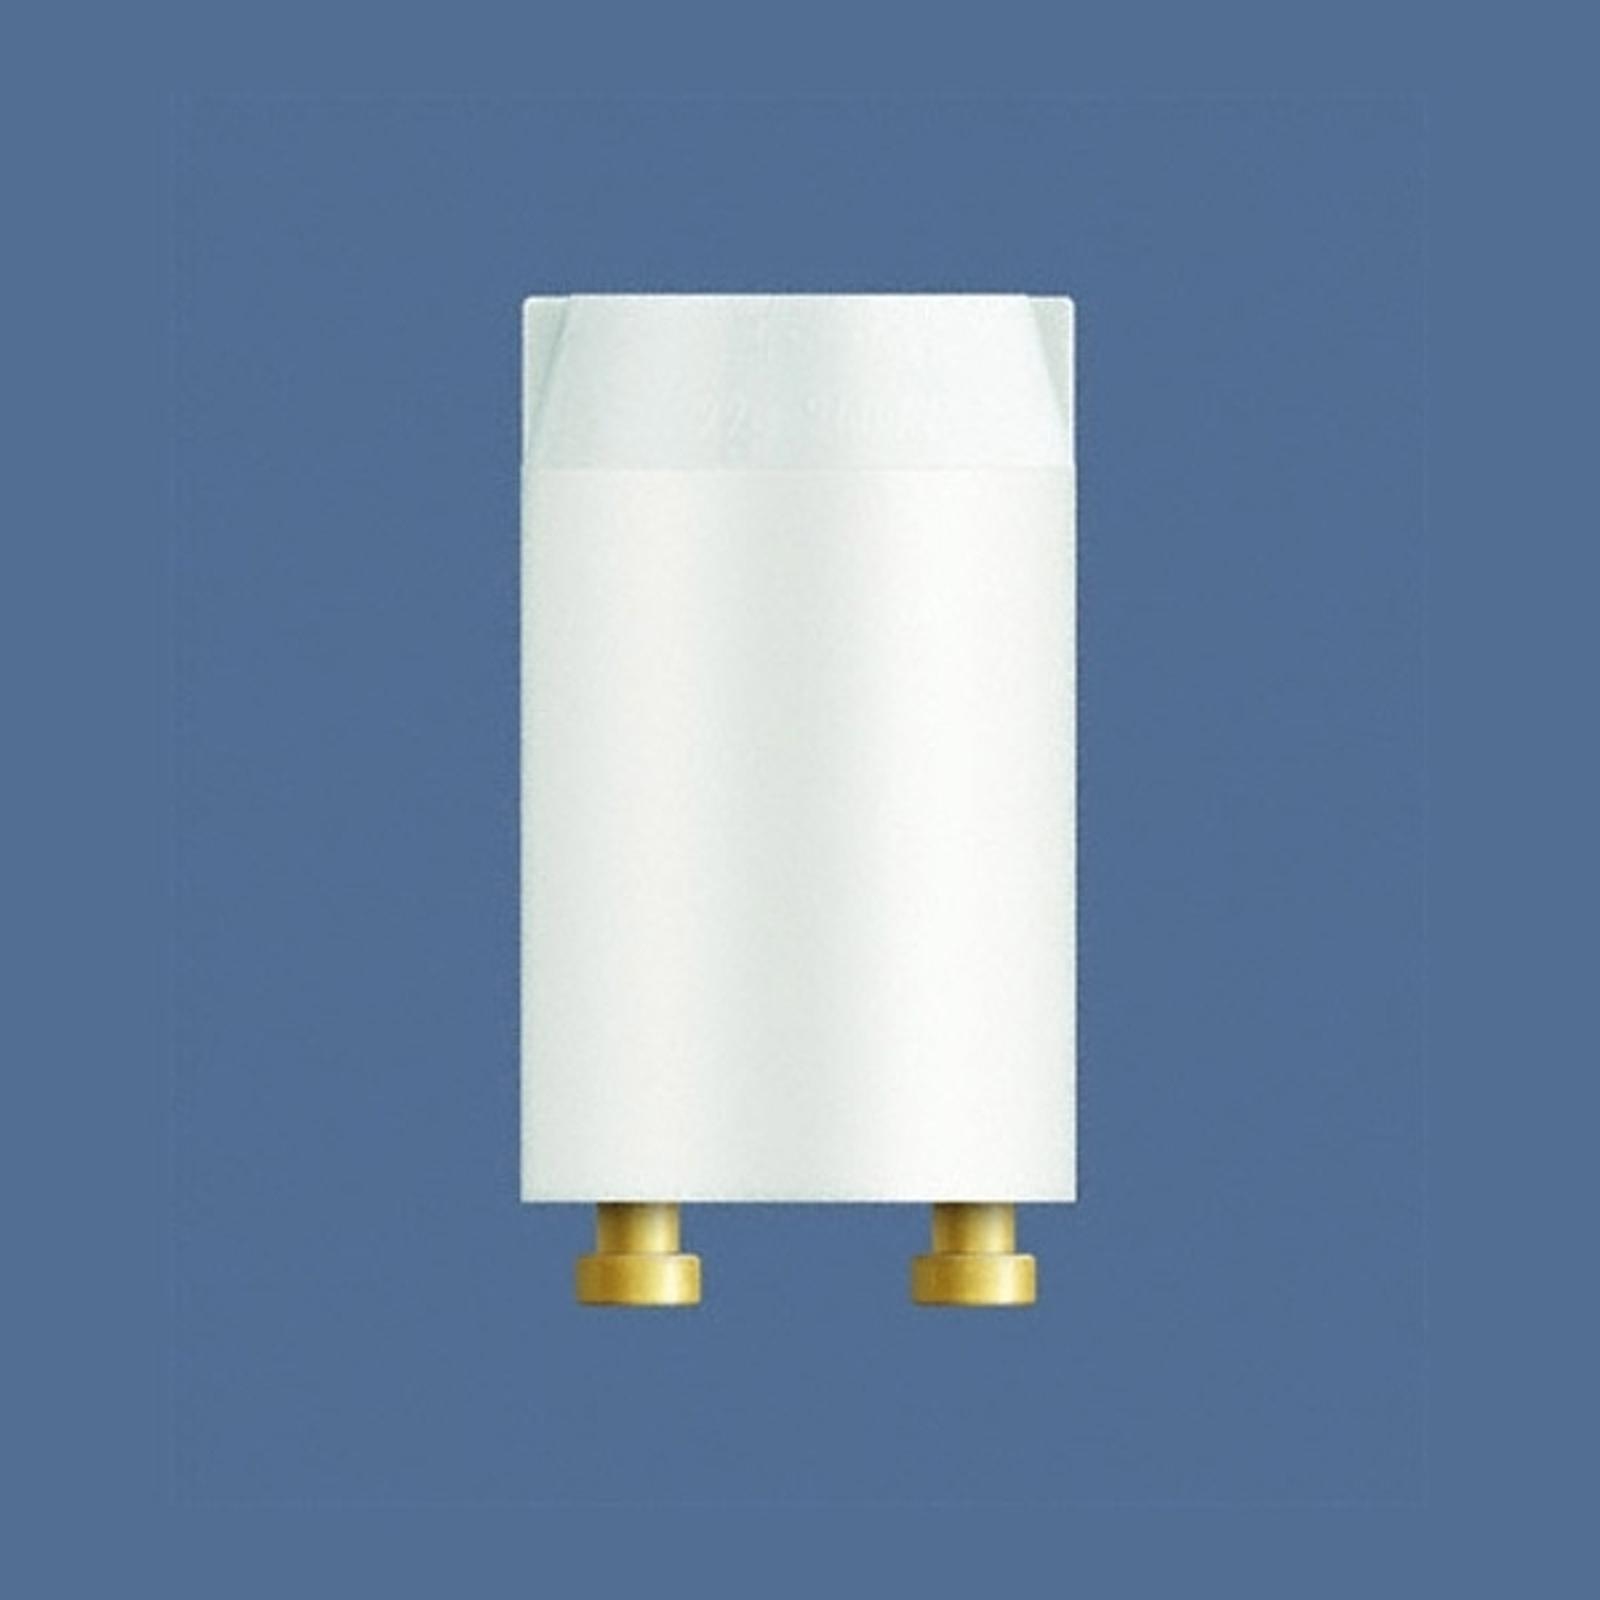 ST151 starter til lysstofrør 4-22W